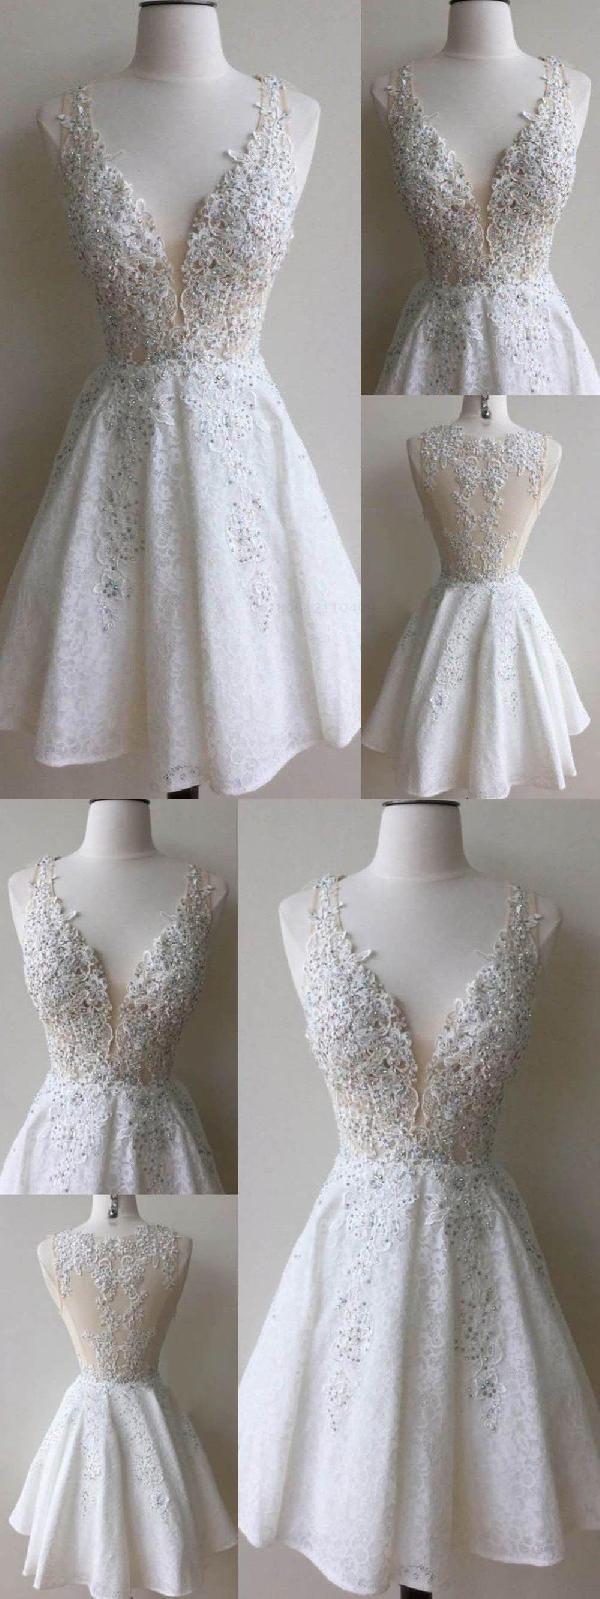 short aline amy homecoming dresses